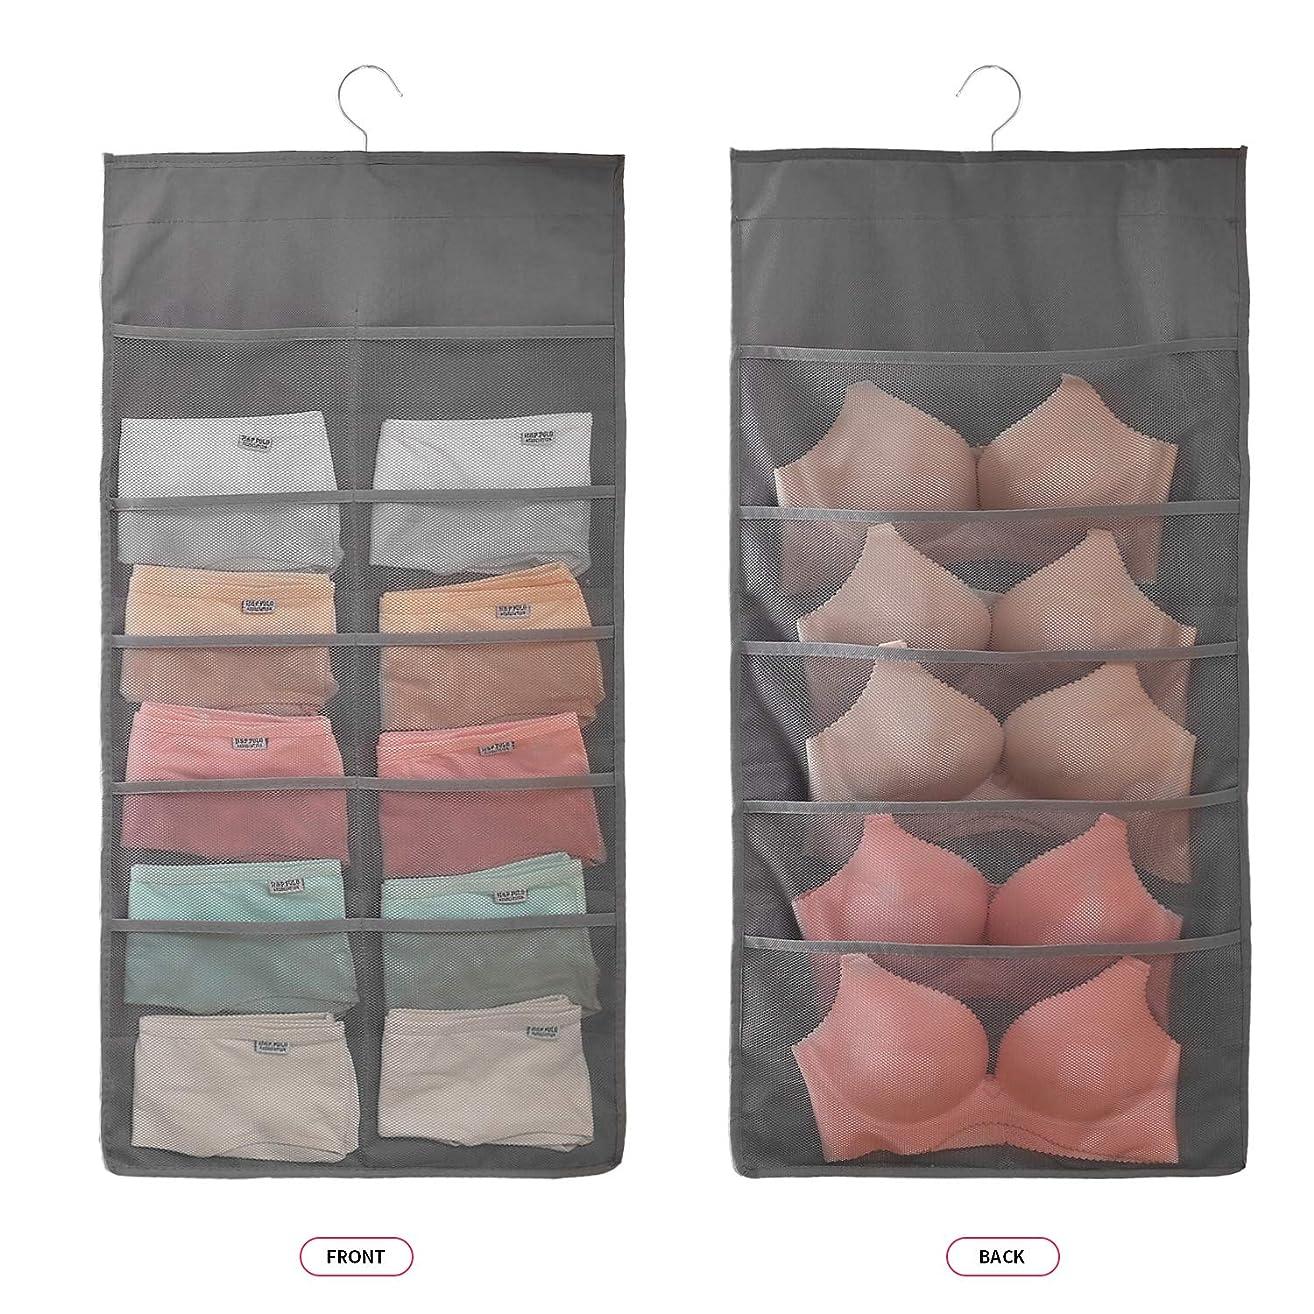 Closet Hanging Organizer with Mesh Pockets & Rotating Metal Hanger,Dual Sided Wall Shelf Wardrobe Storage Bags,Oxford Cloth Space Saver Bag for Bra Underwear Underpants Socks (Gray, Big 15 Pocket)